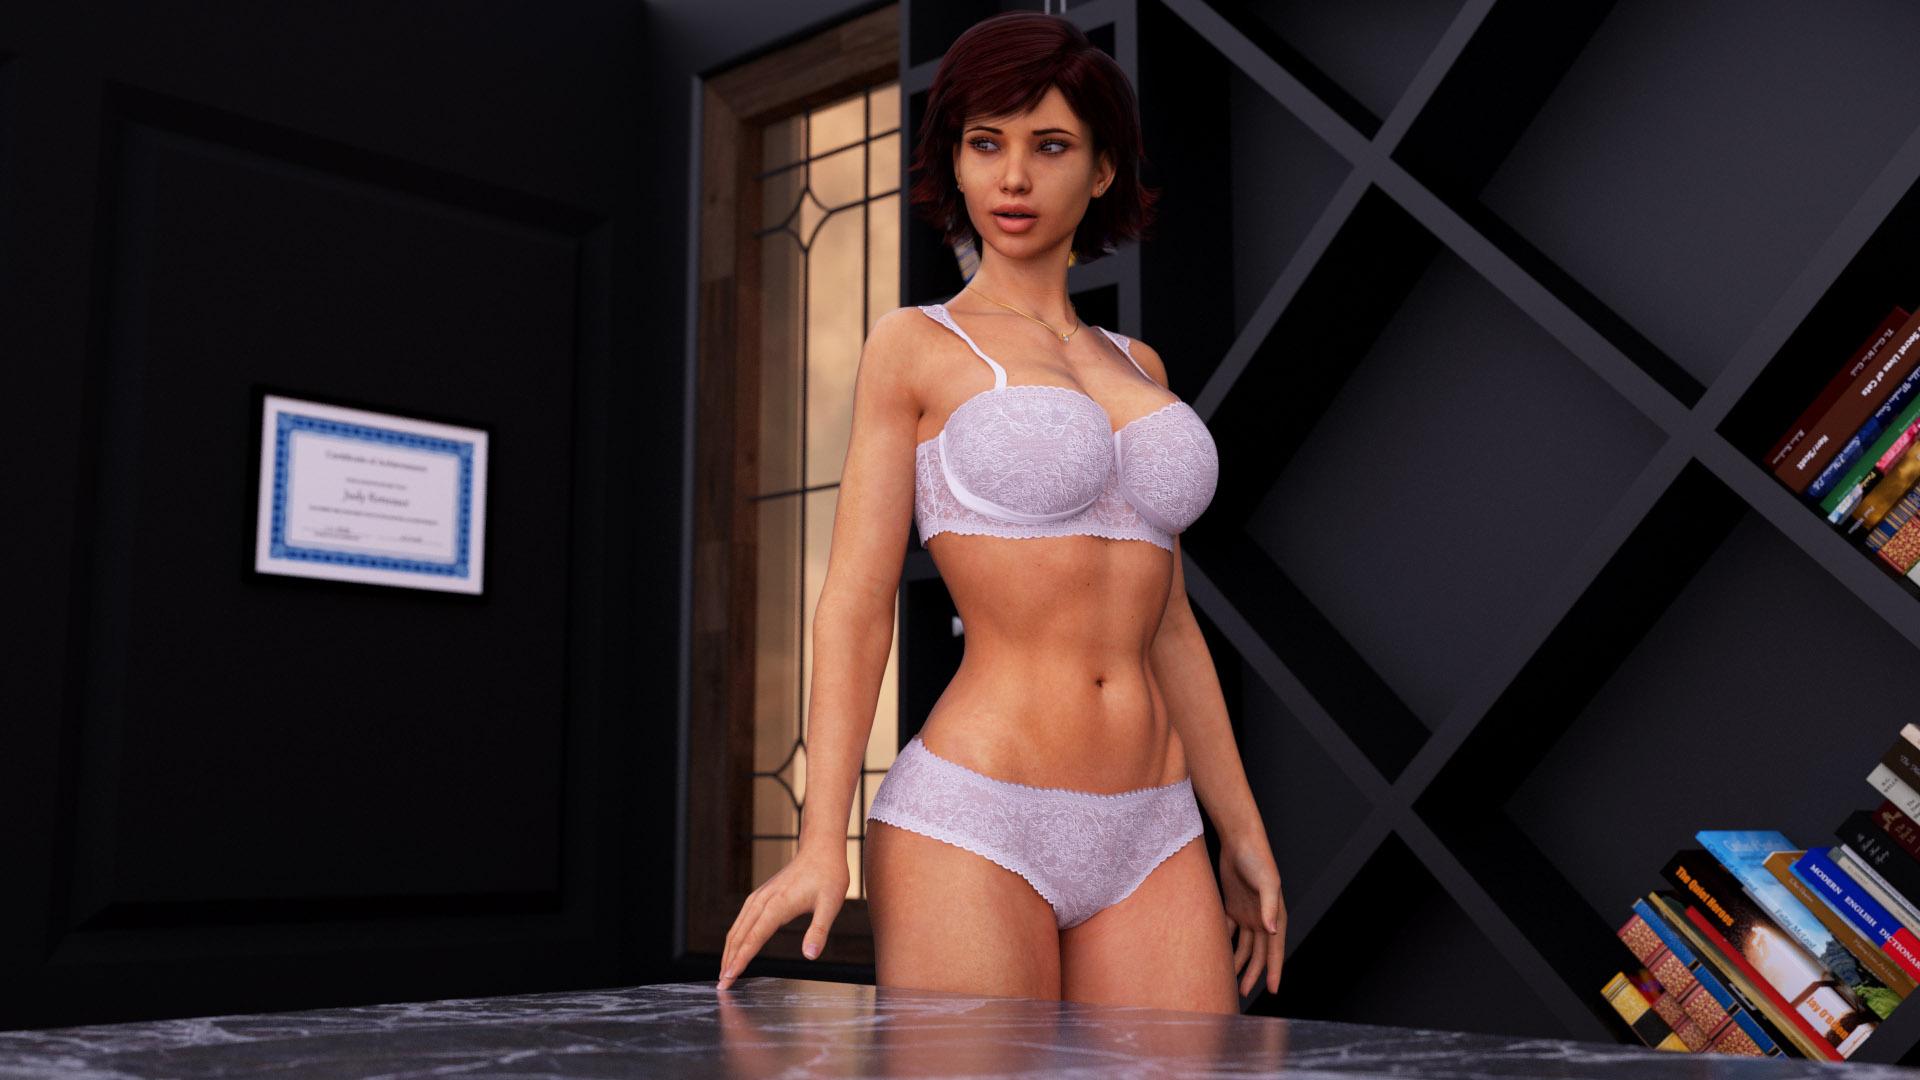 Milfy City girl in lingerie